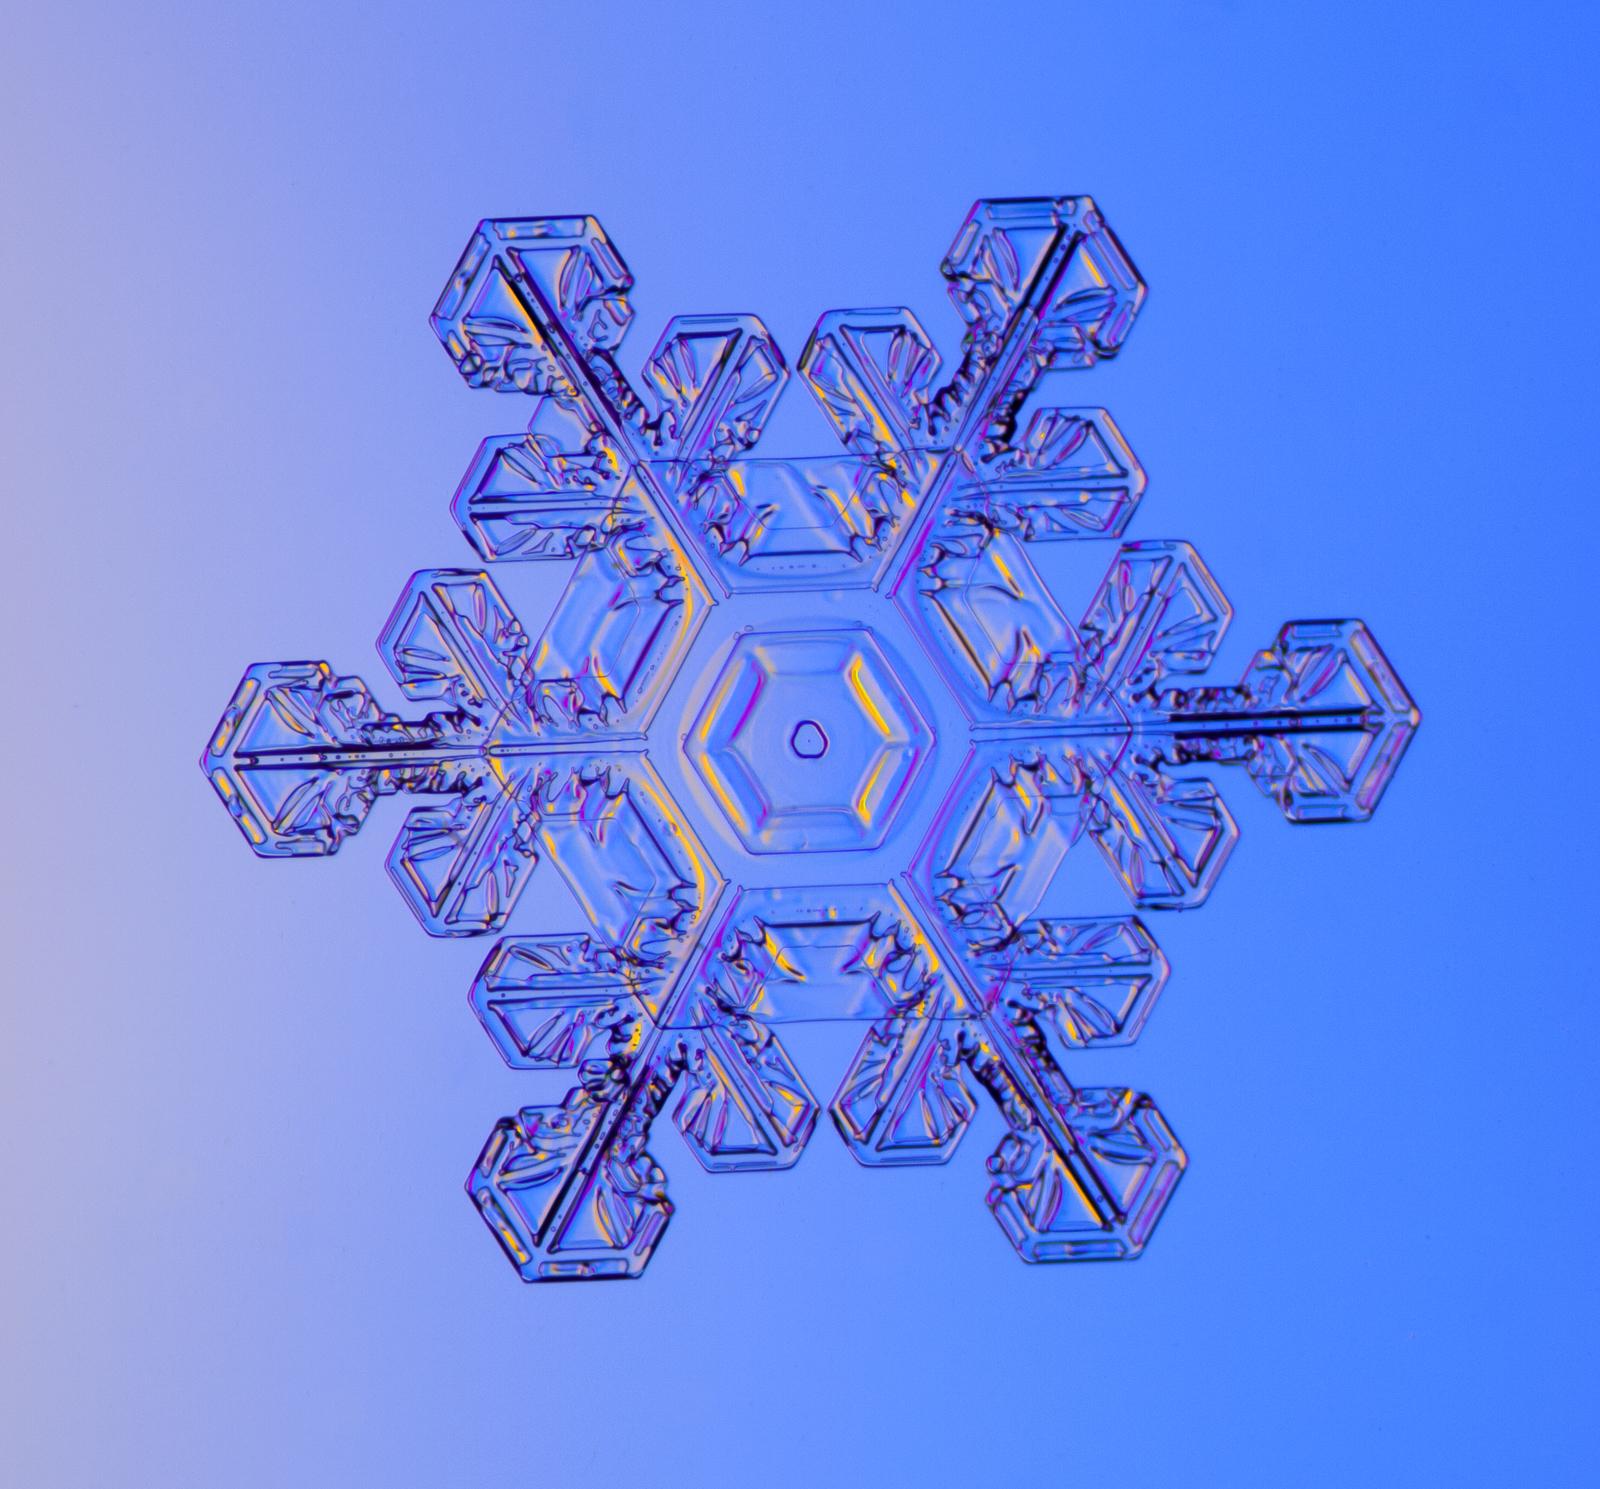 Snow, snowflake, snow crystal, real snowflake, snowflake photography